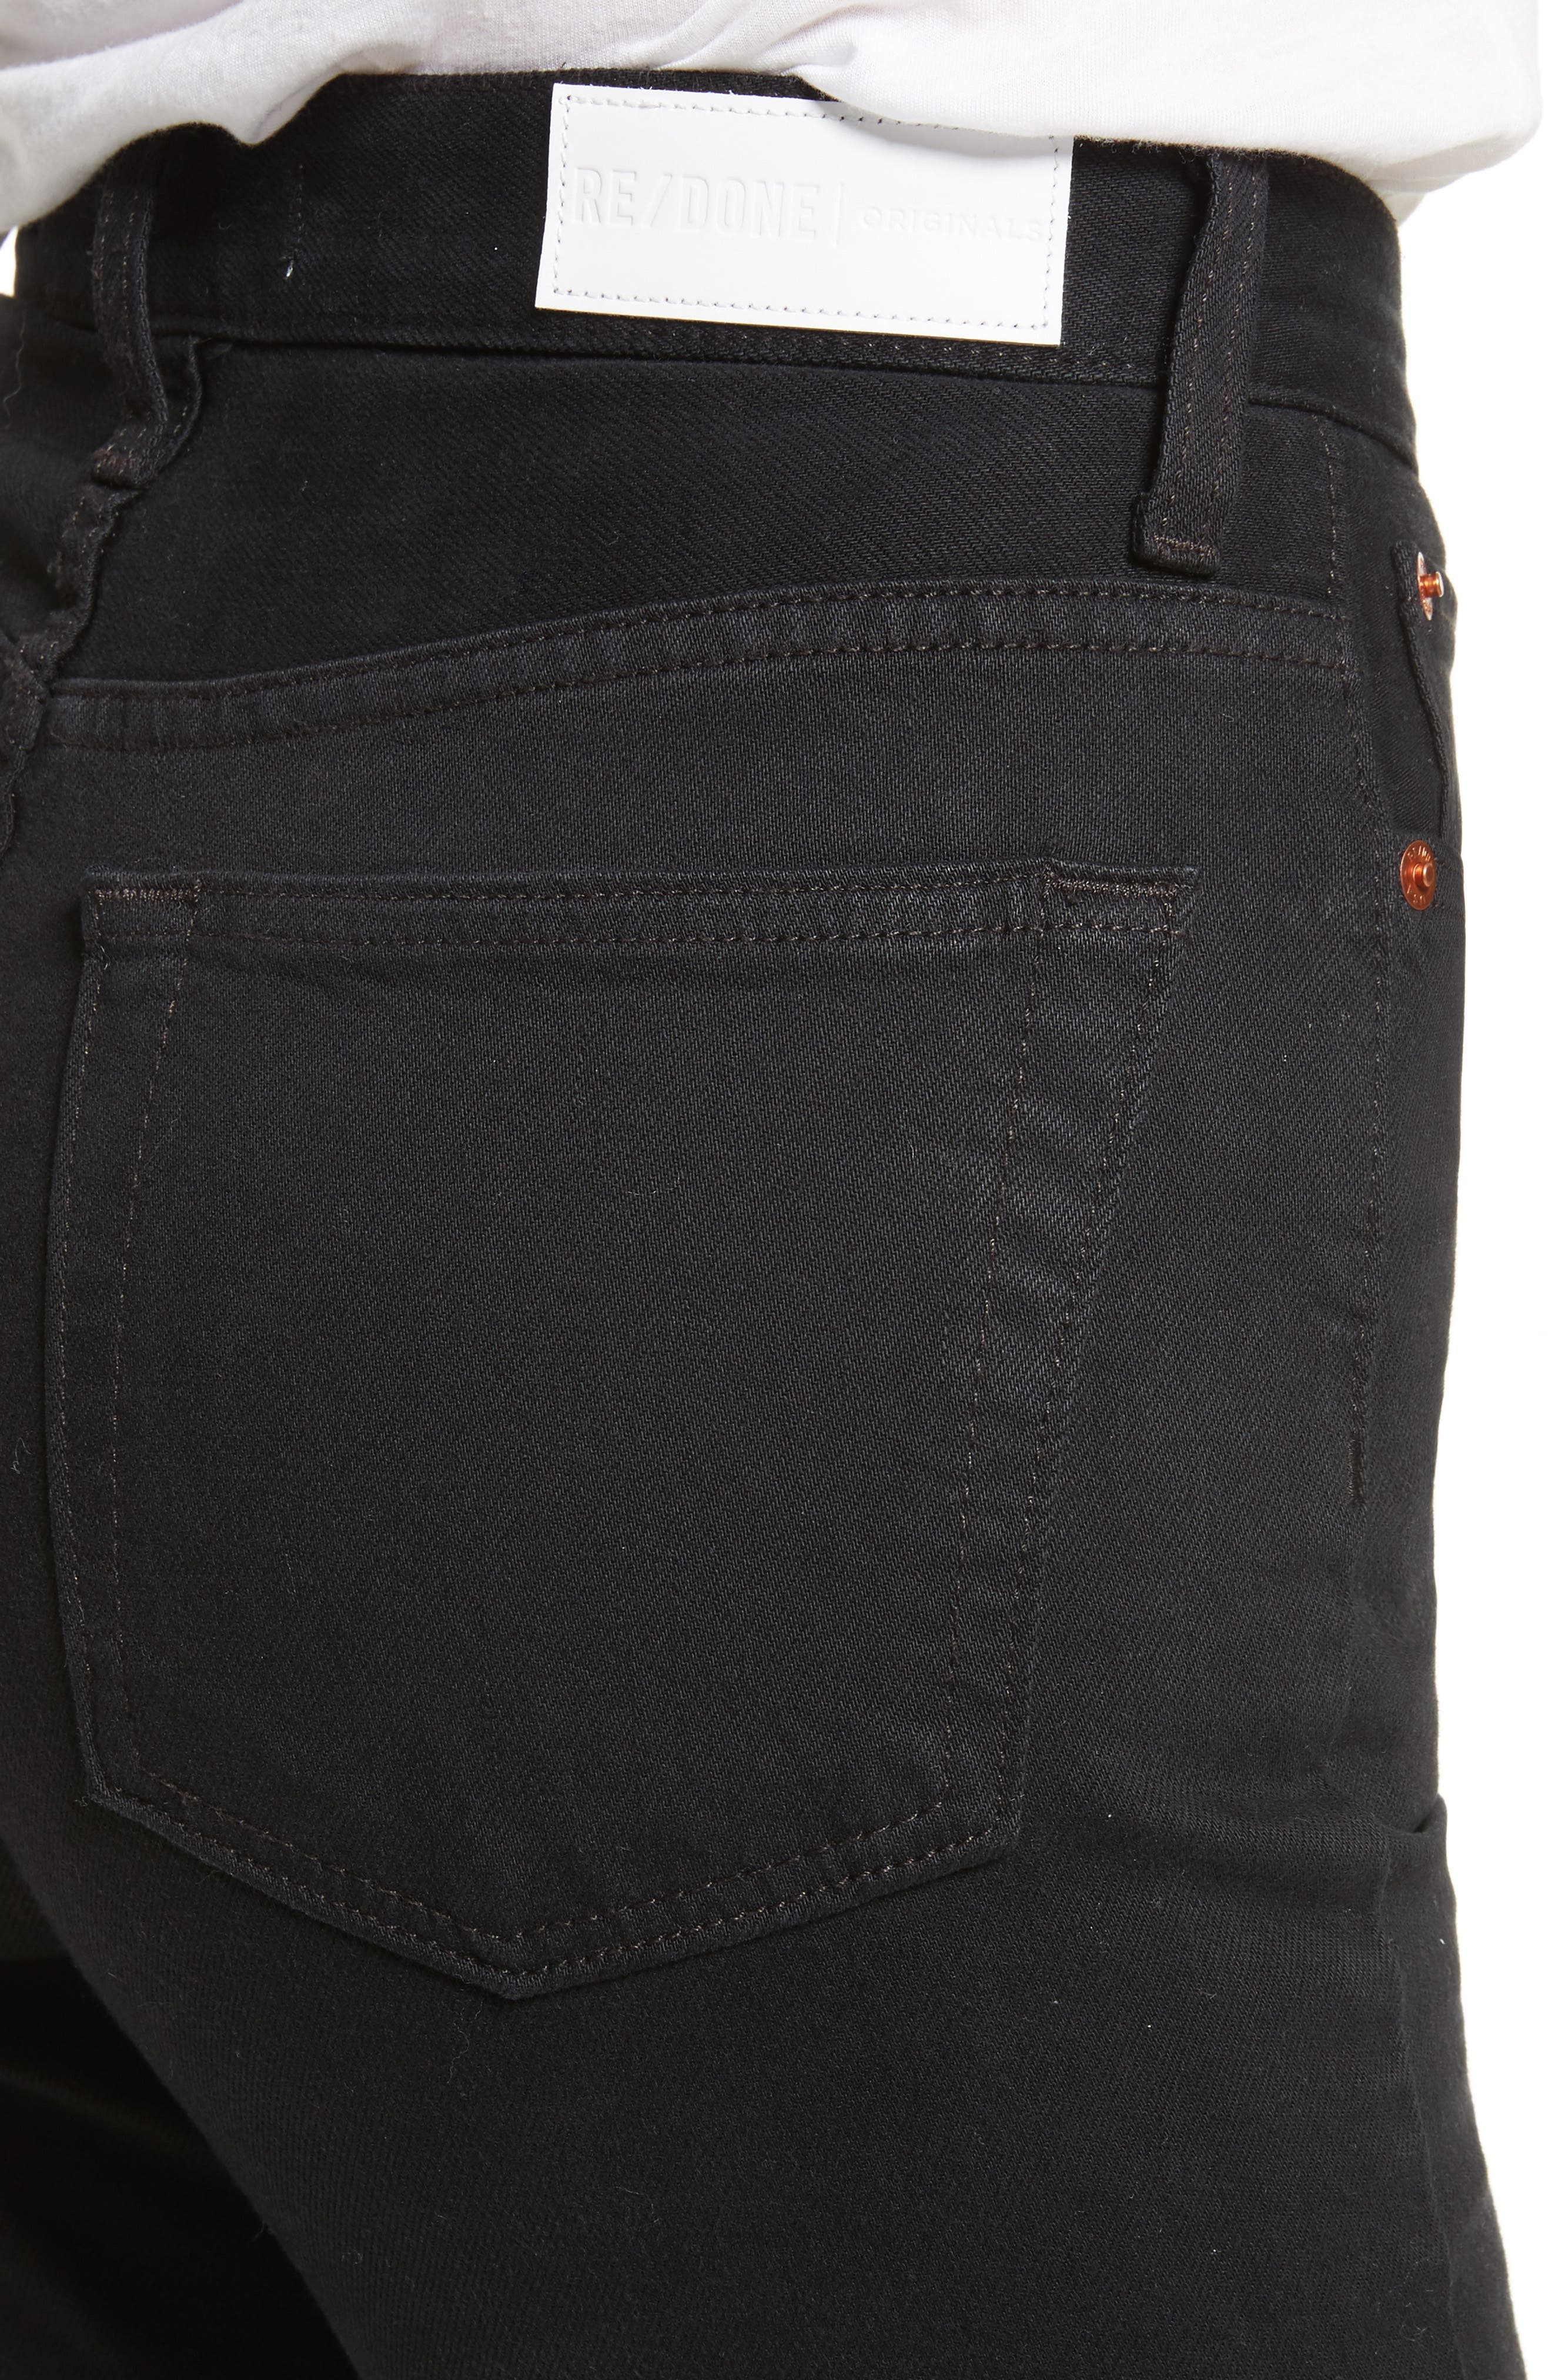 Originals Ultra High Waist Skinny Jeans,                             Alternate thumbnail 4, color,                             001